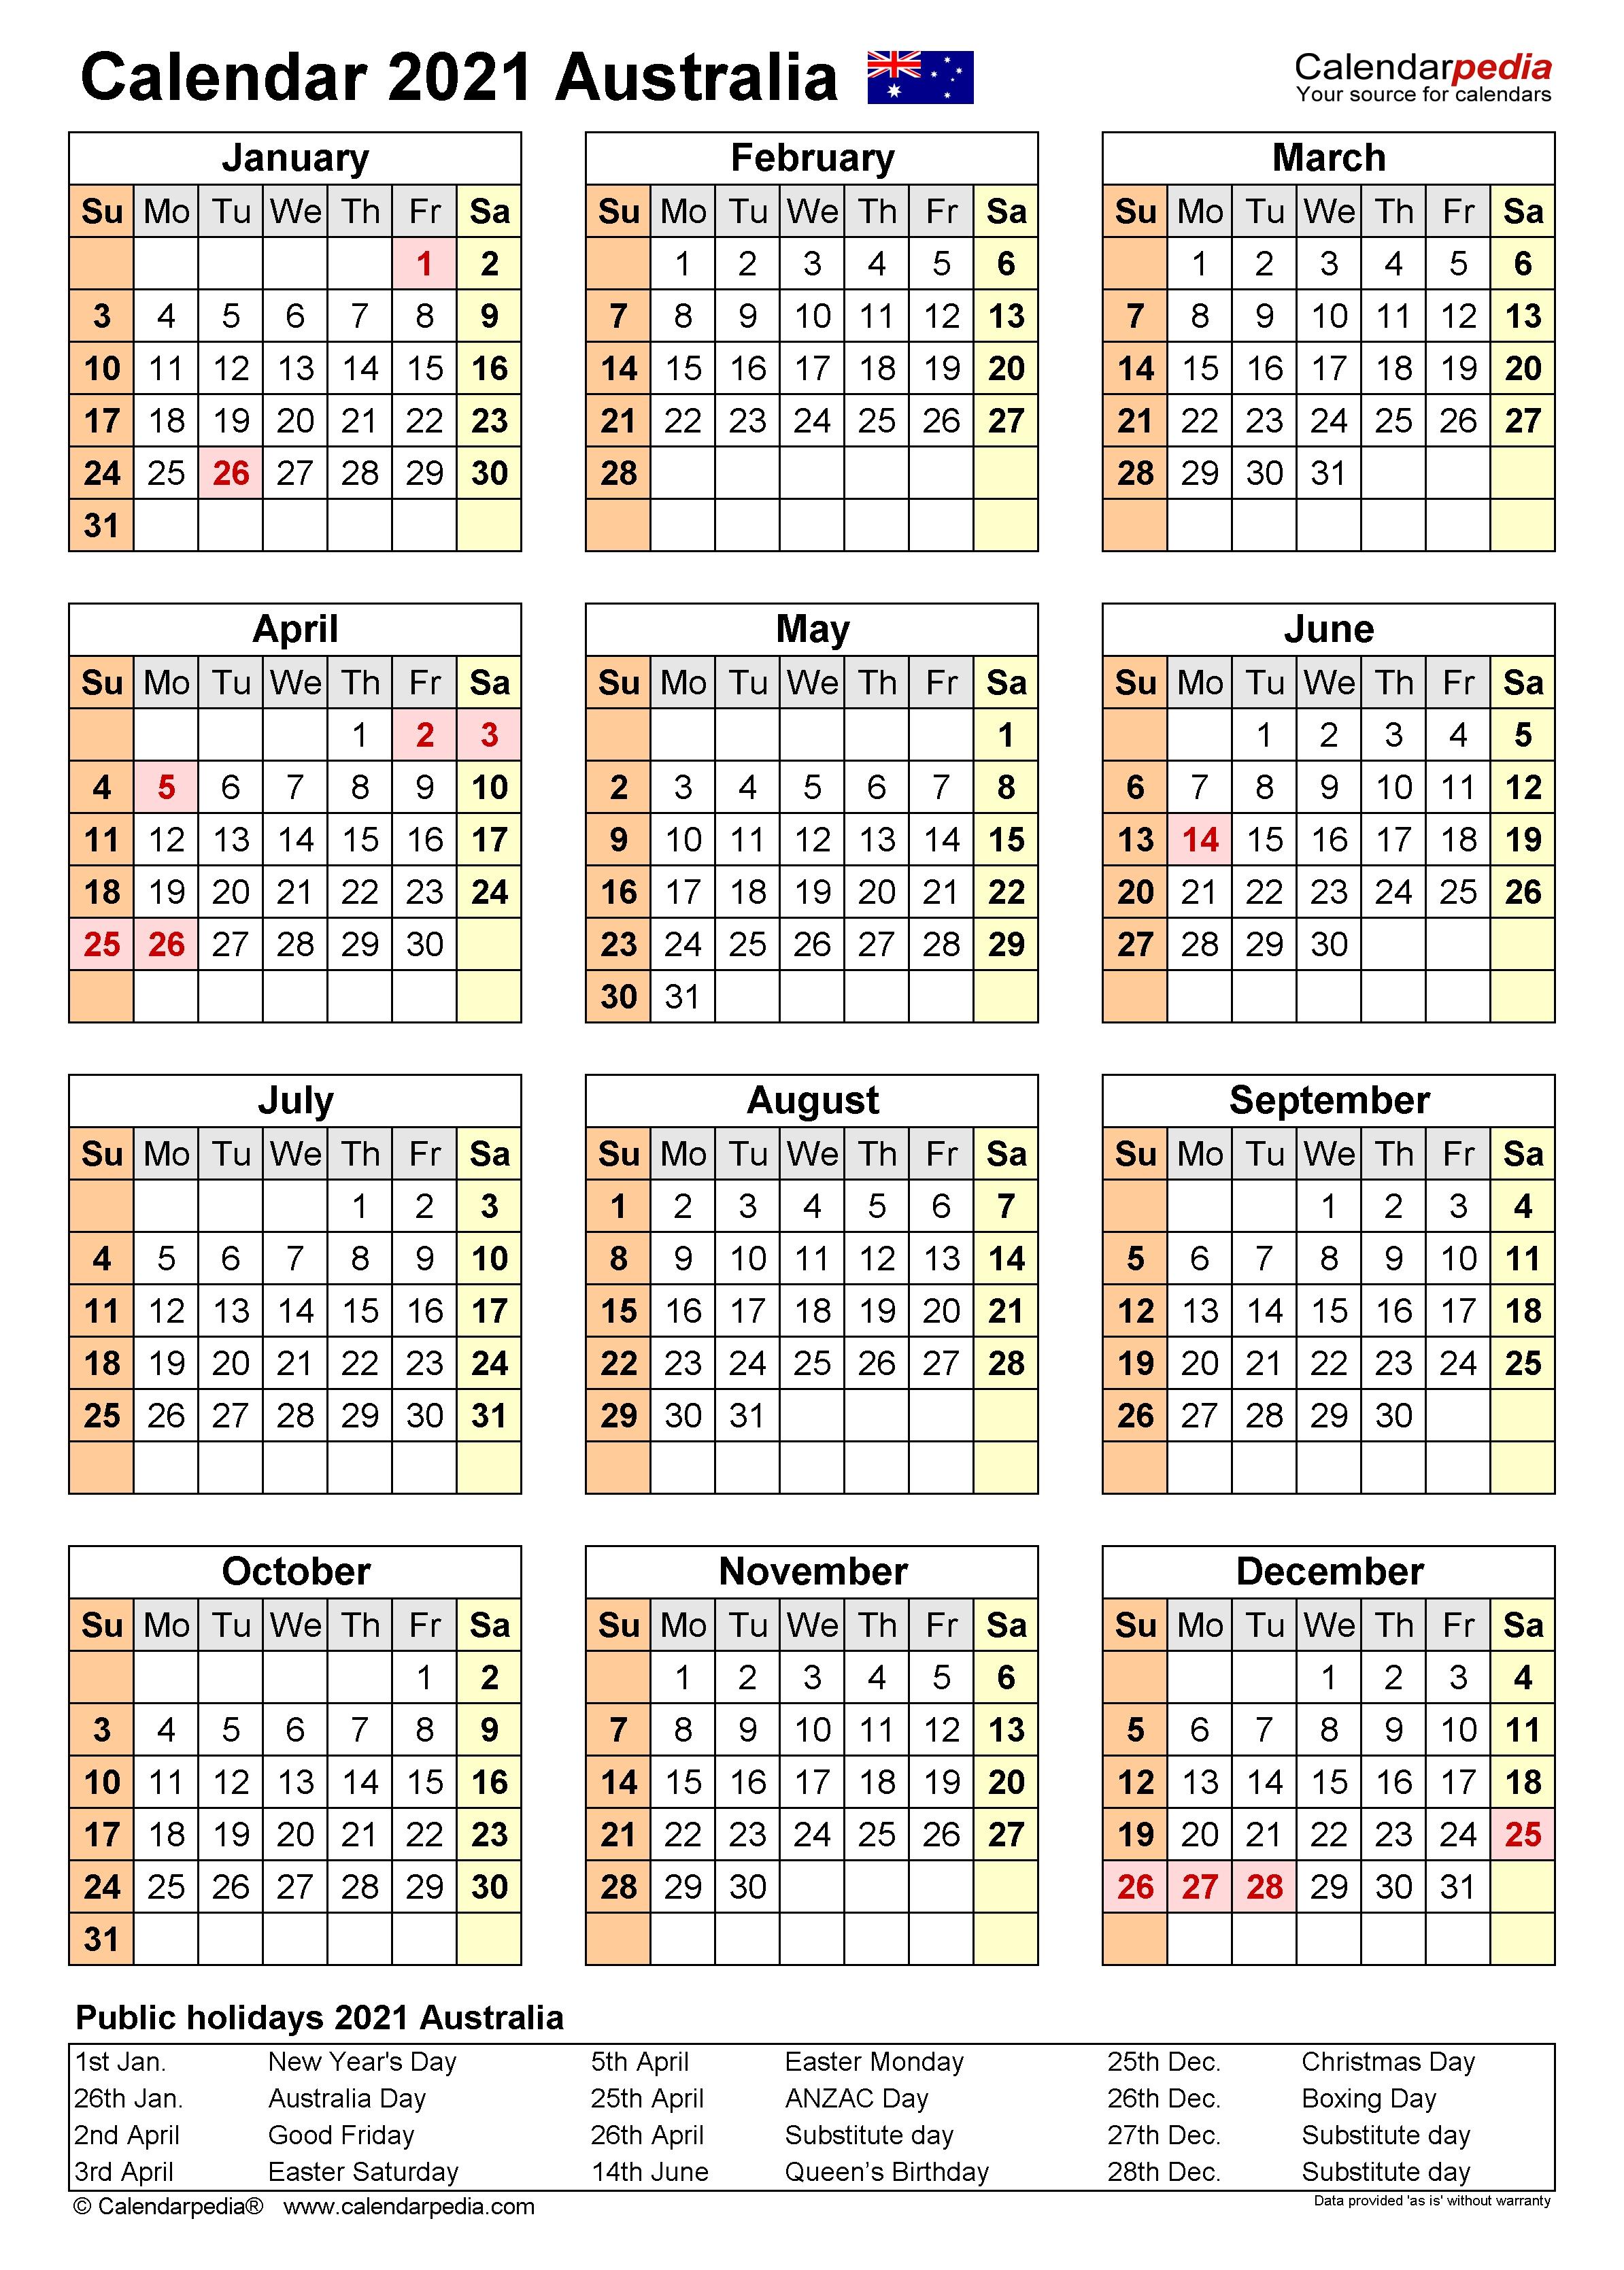 Australia Calendar 2021 - Free Printable Word Templates  Financial Years Dates Australia